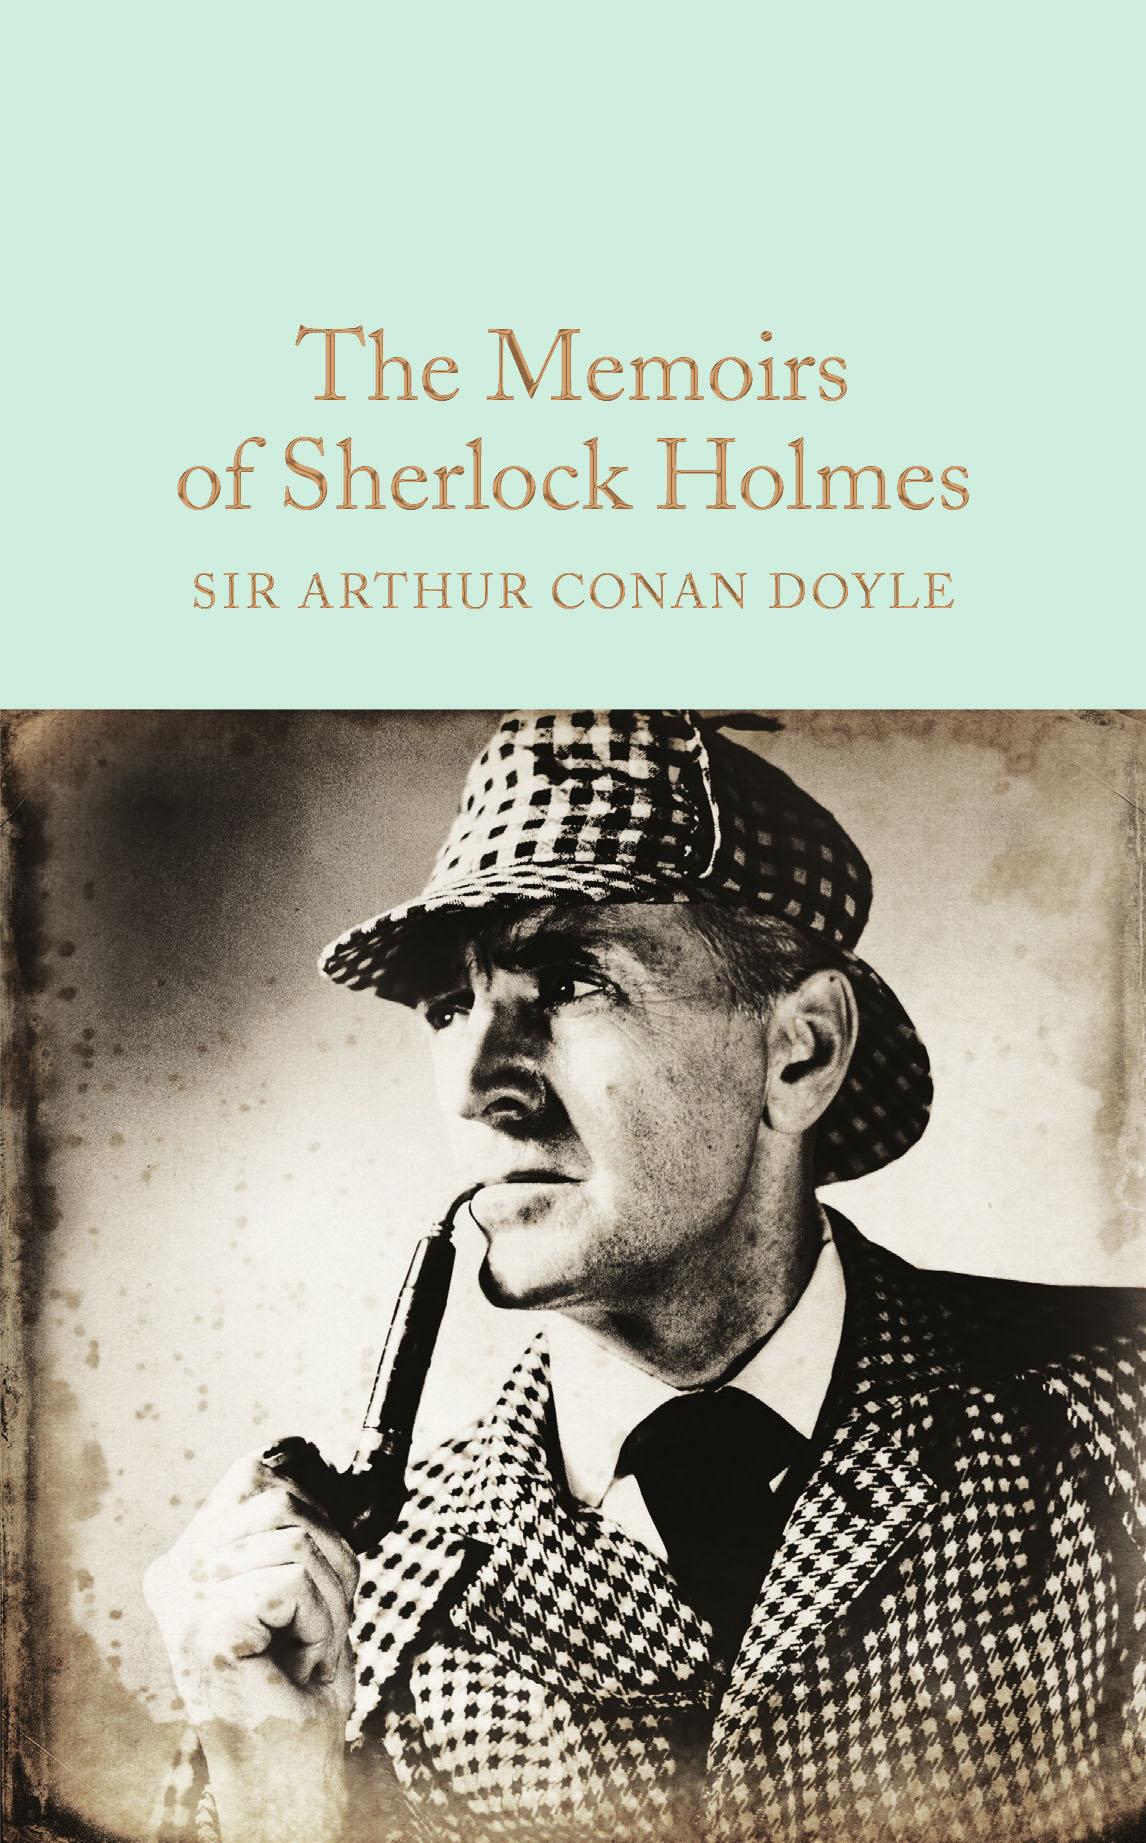 The Memoirs of Sherlock Holmes dayle a c the adventures of sherlock holmes рассказы на английском языке